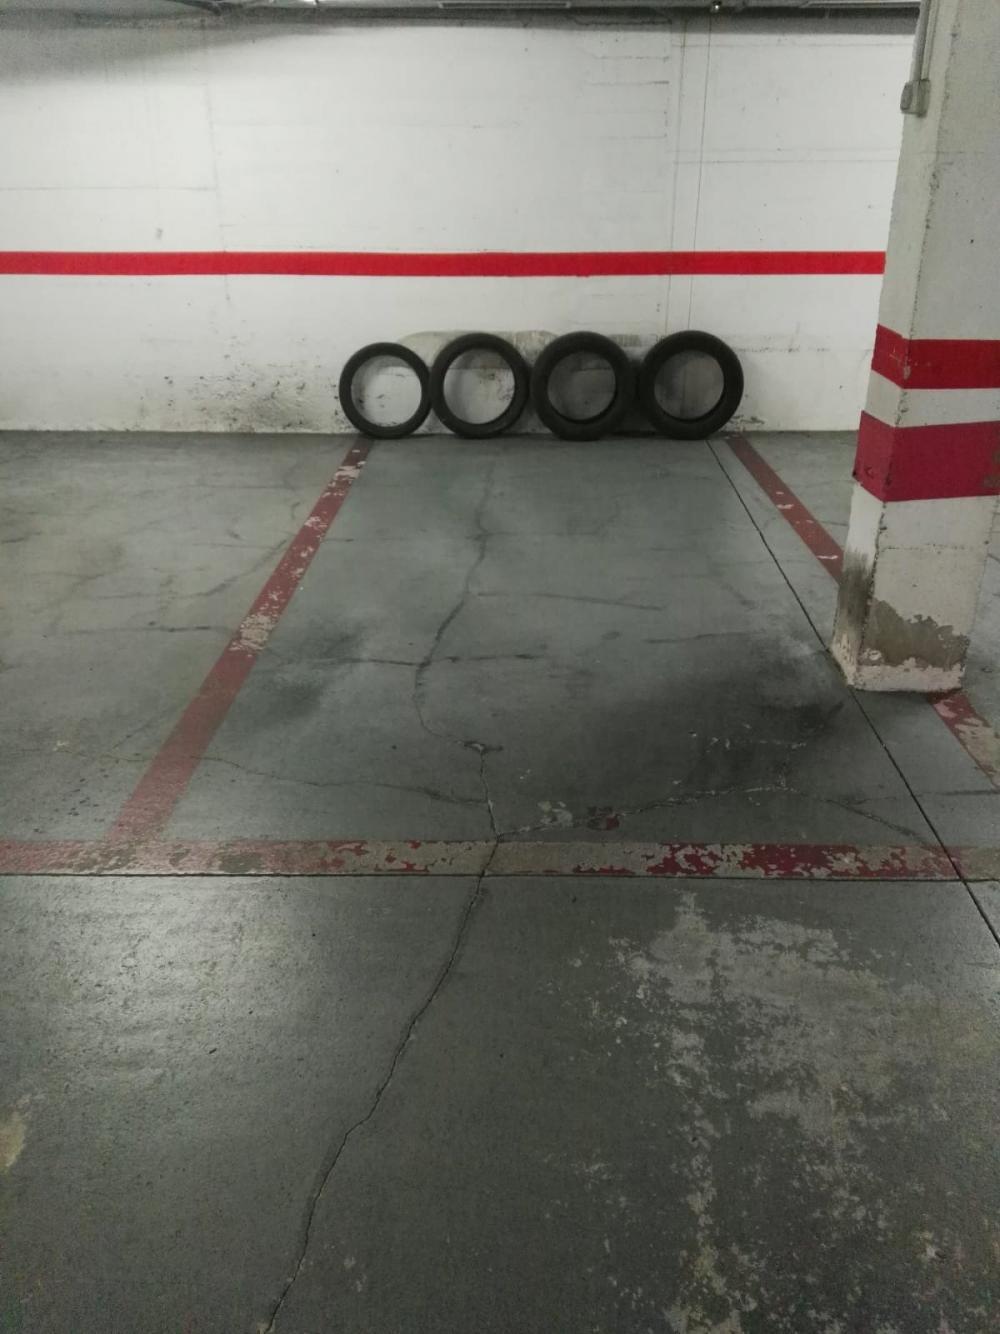 palamós gérone parking photo 3051350